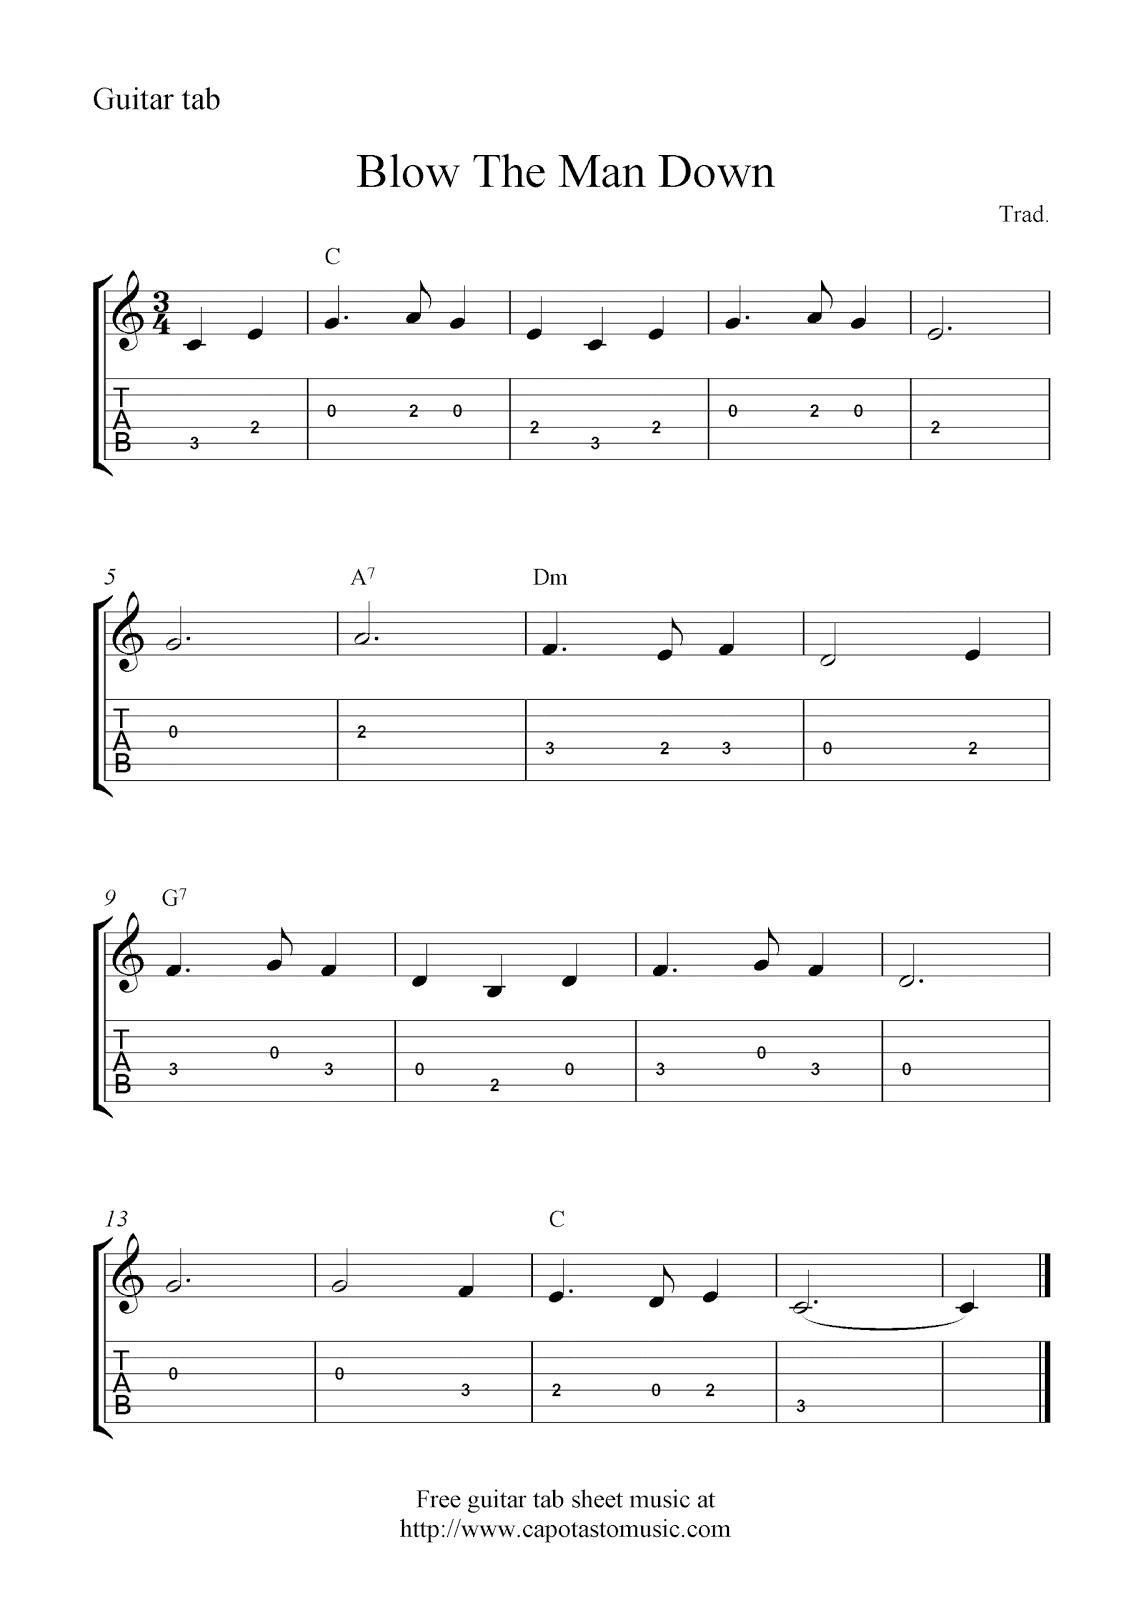 Free guitar tab sheet music, Blow The Man Down